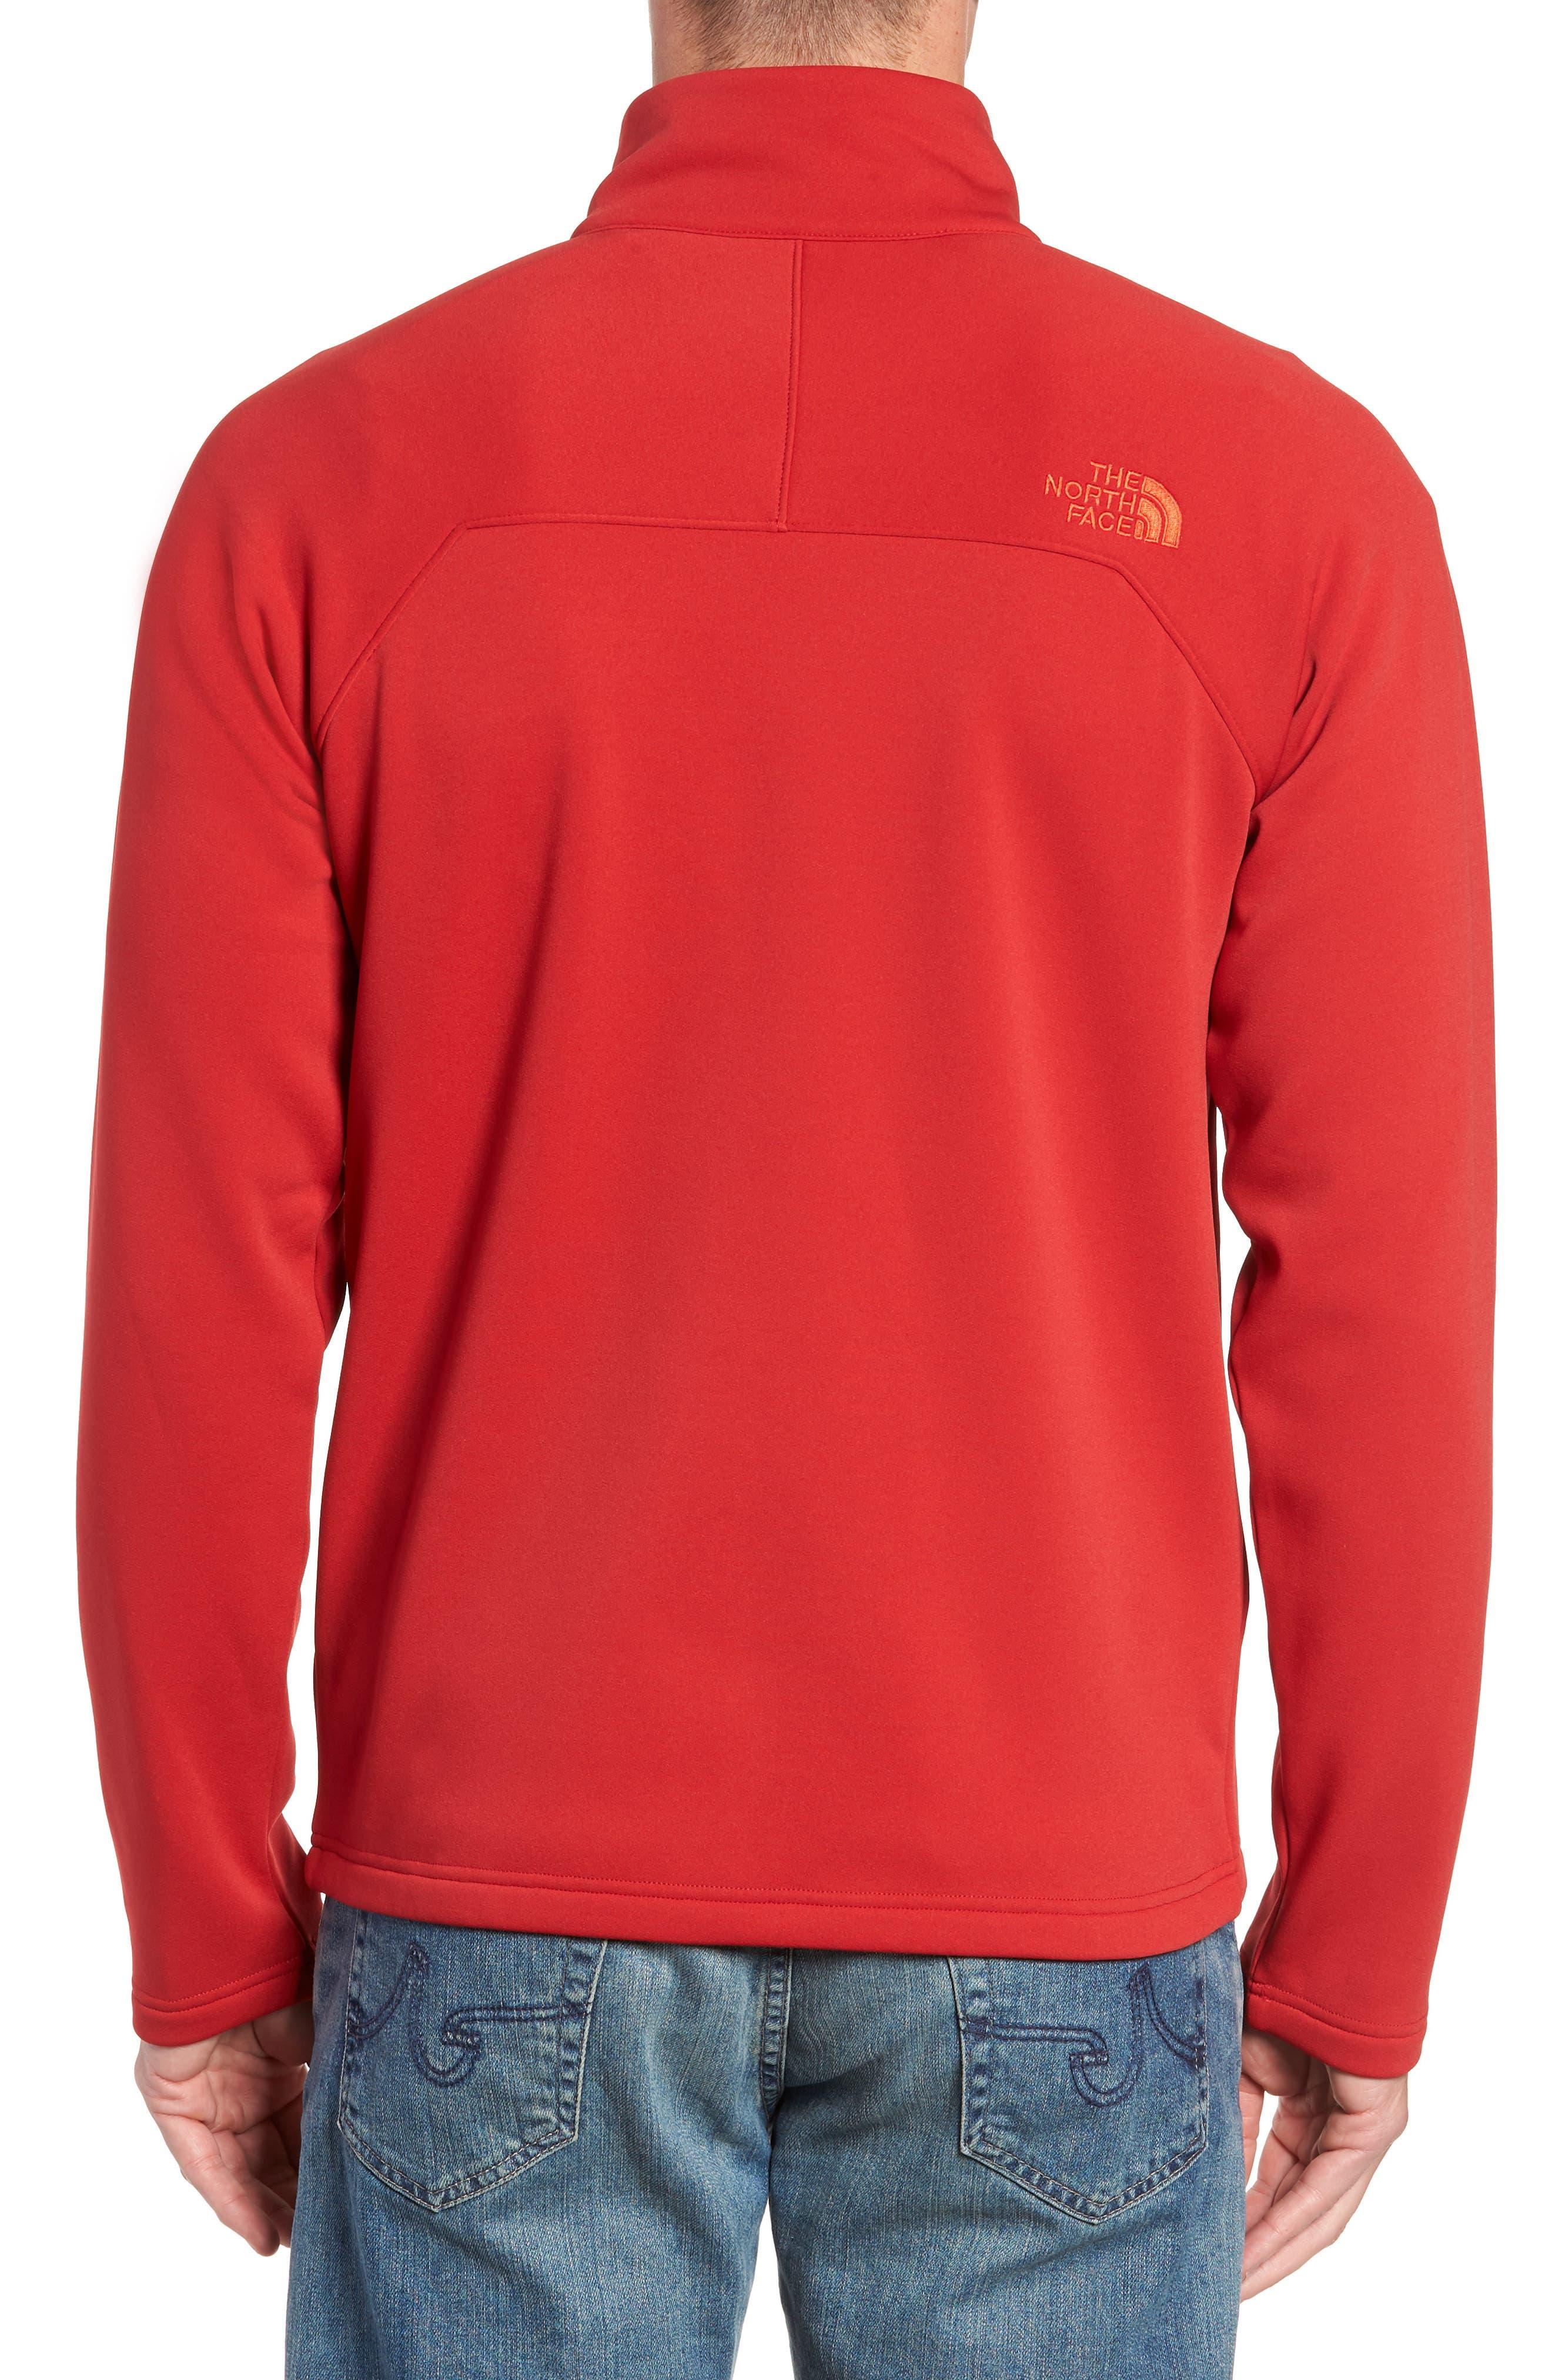 Tenacious Zip Jacket,                             Alternate thumbnail 2, color,                             RAGE RED